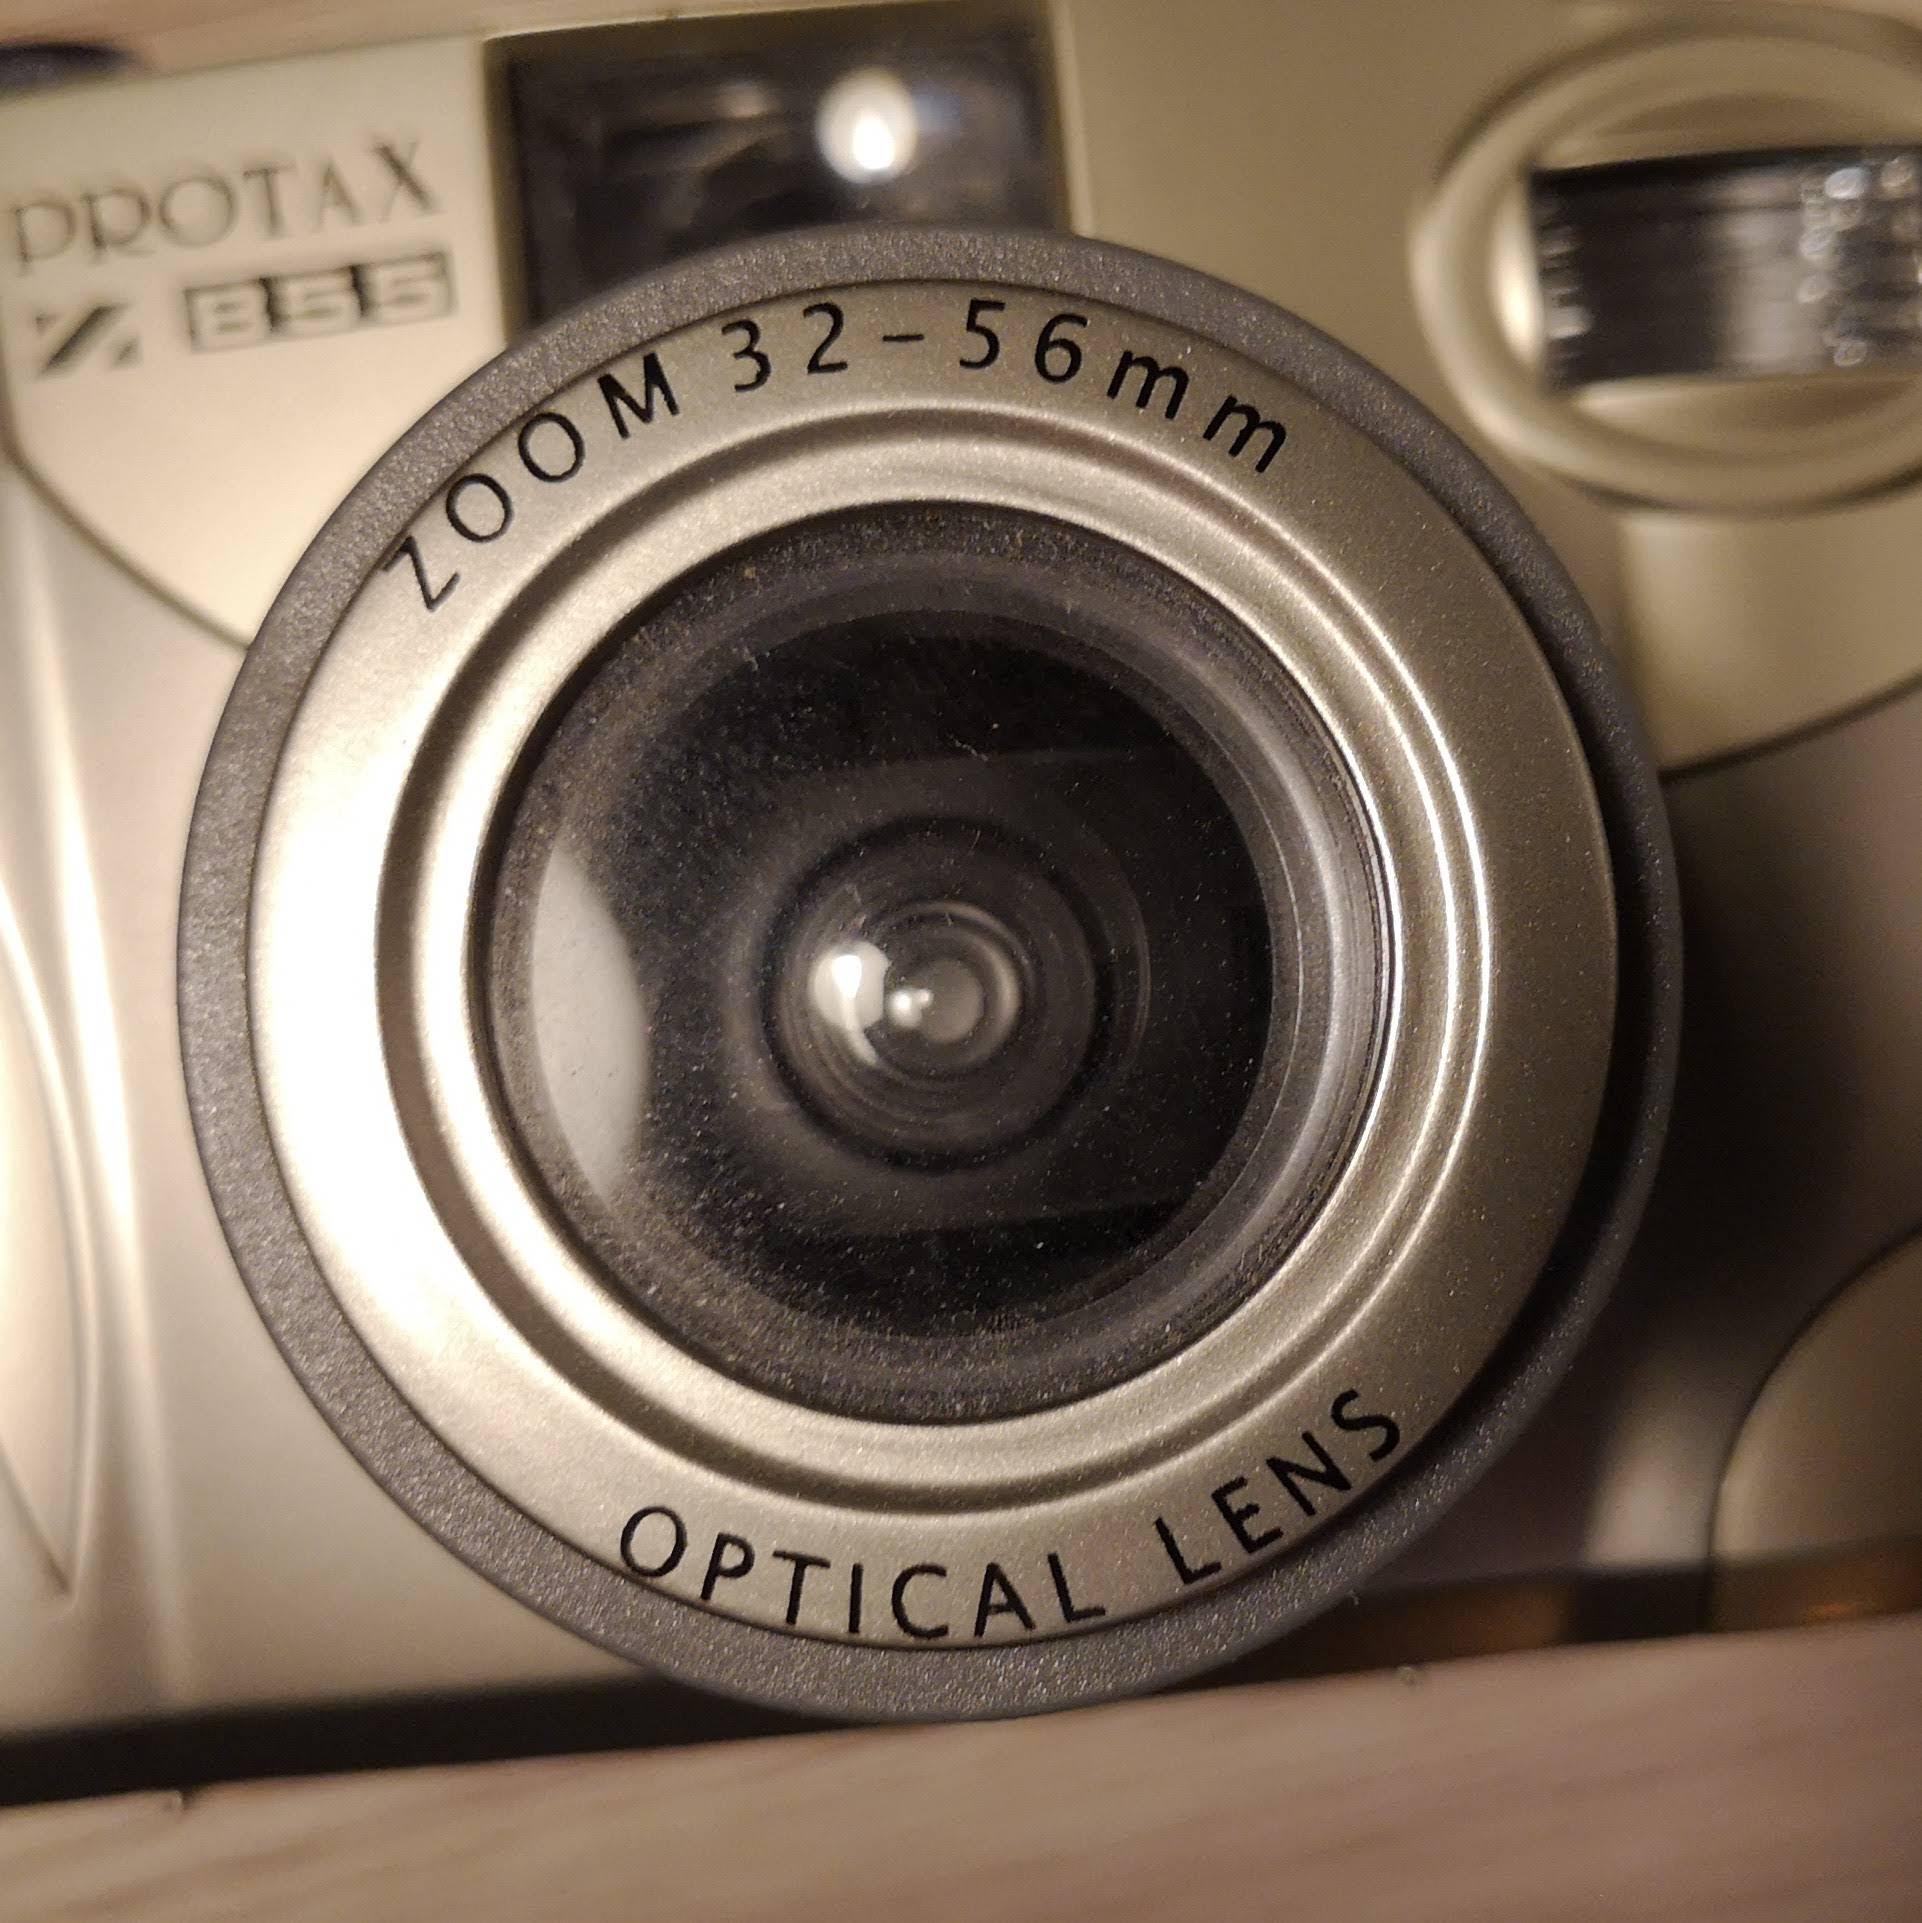 Lens barrel Protax Z 855